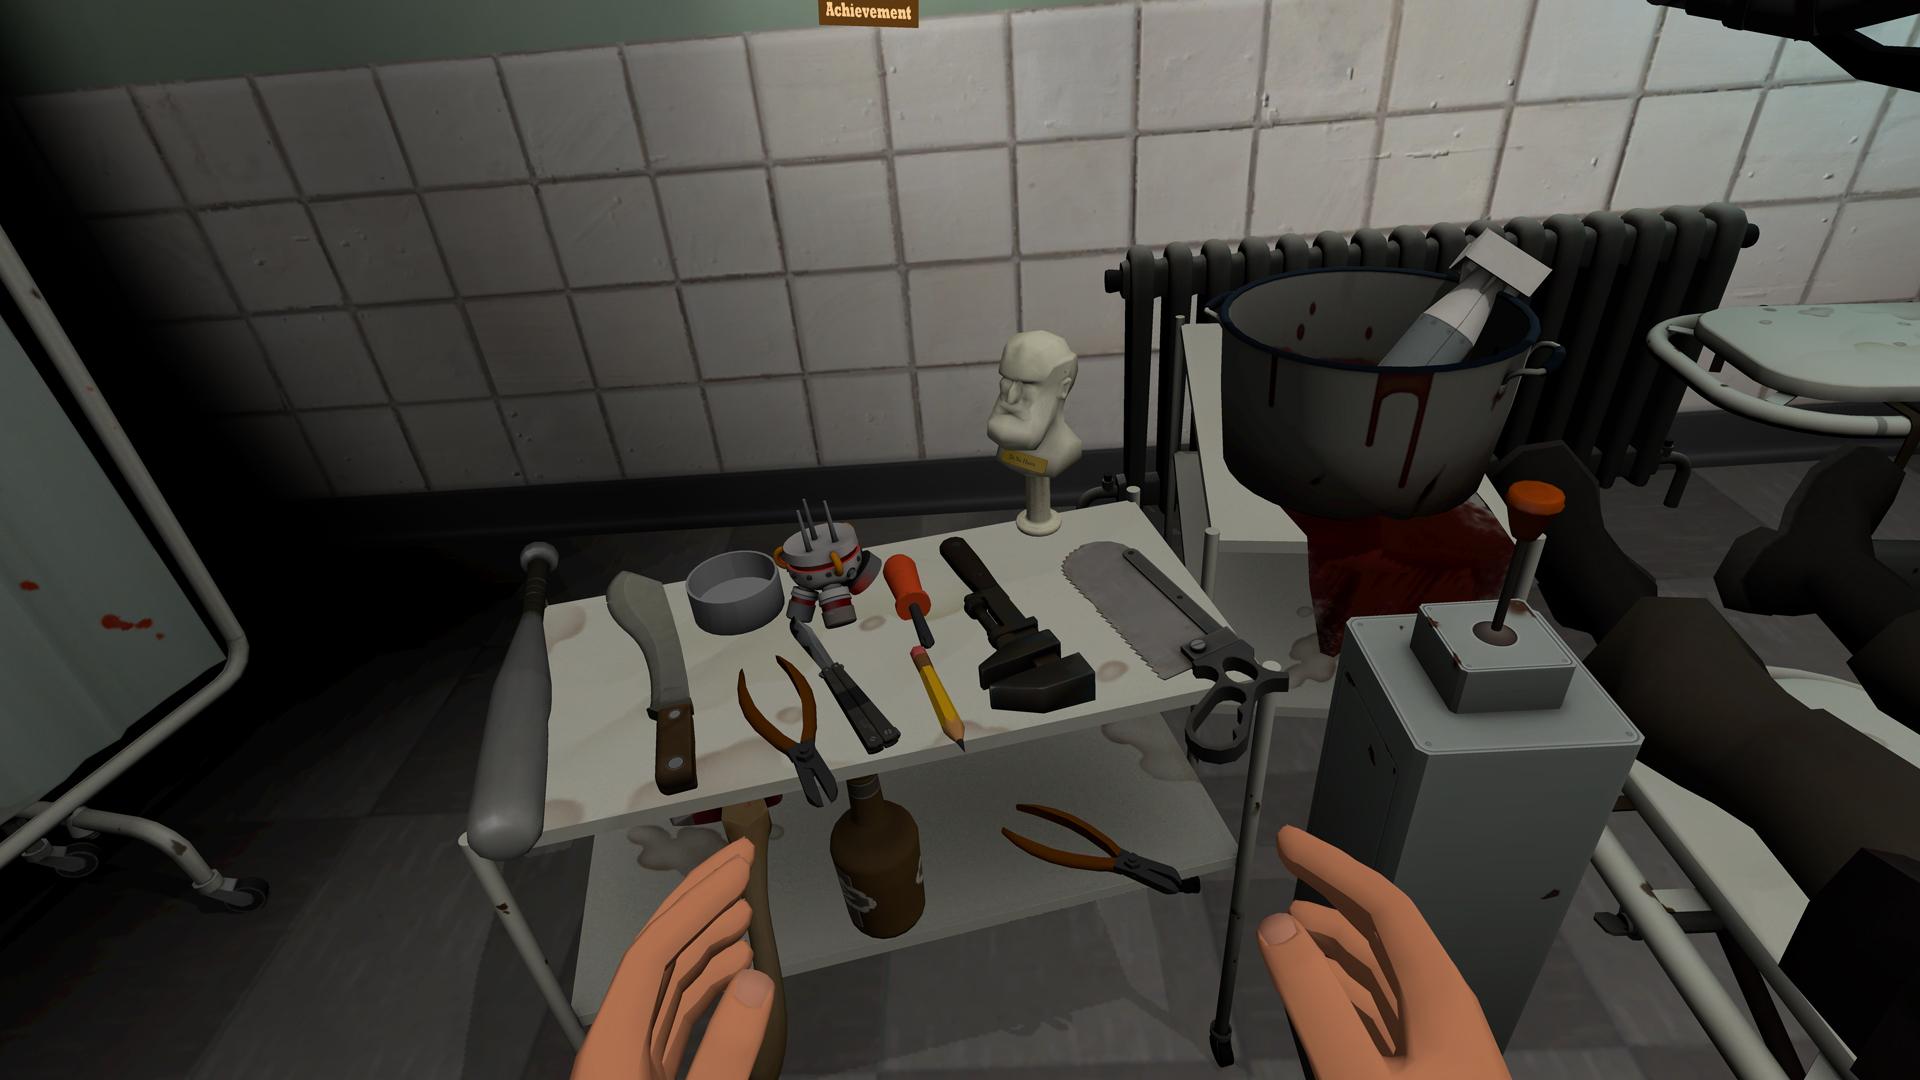 Surgeon Simulator VR: Meet The Medic Screenshot